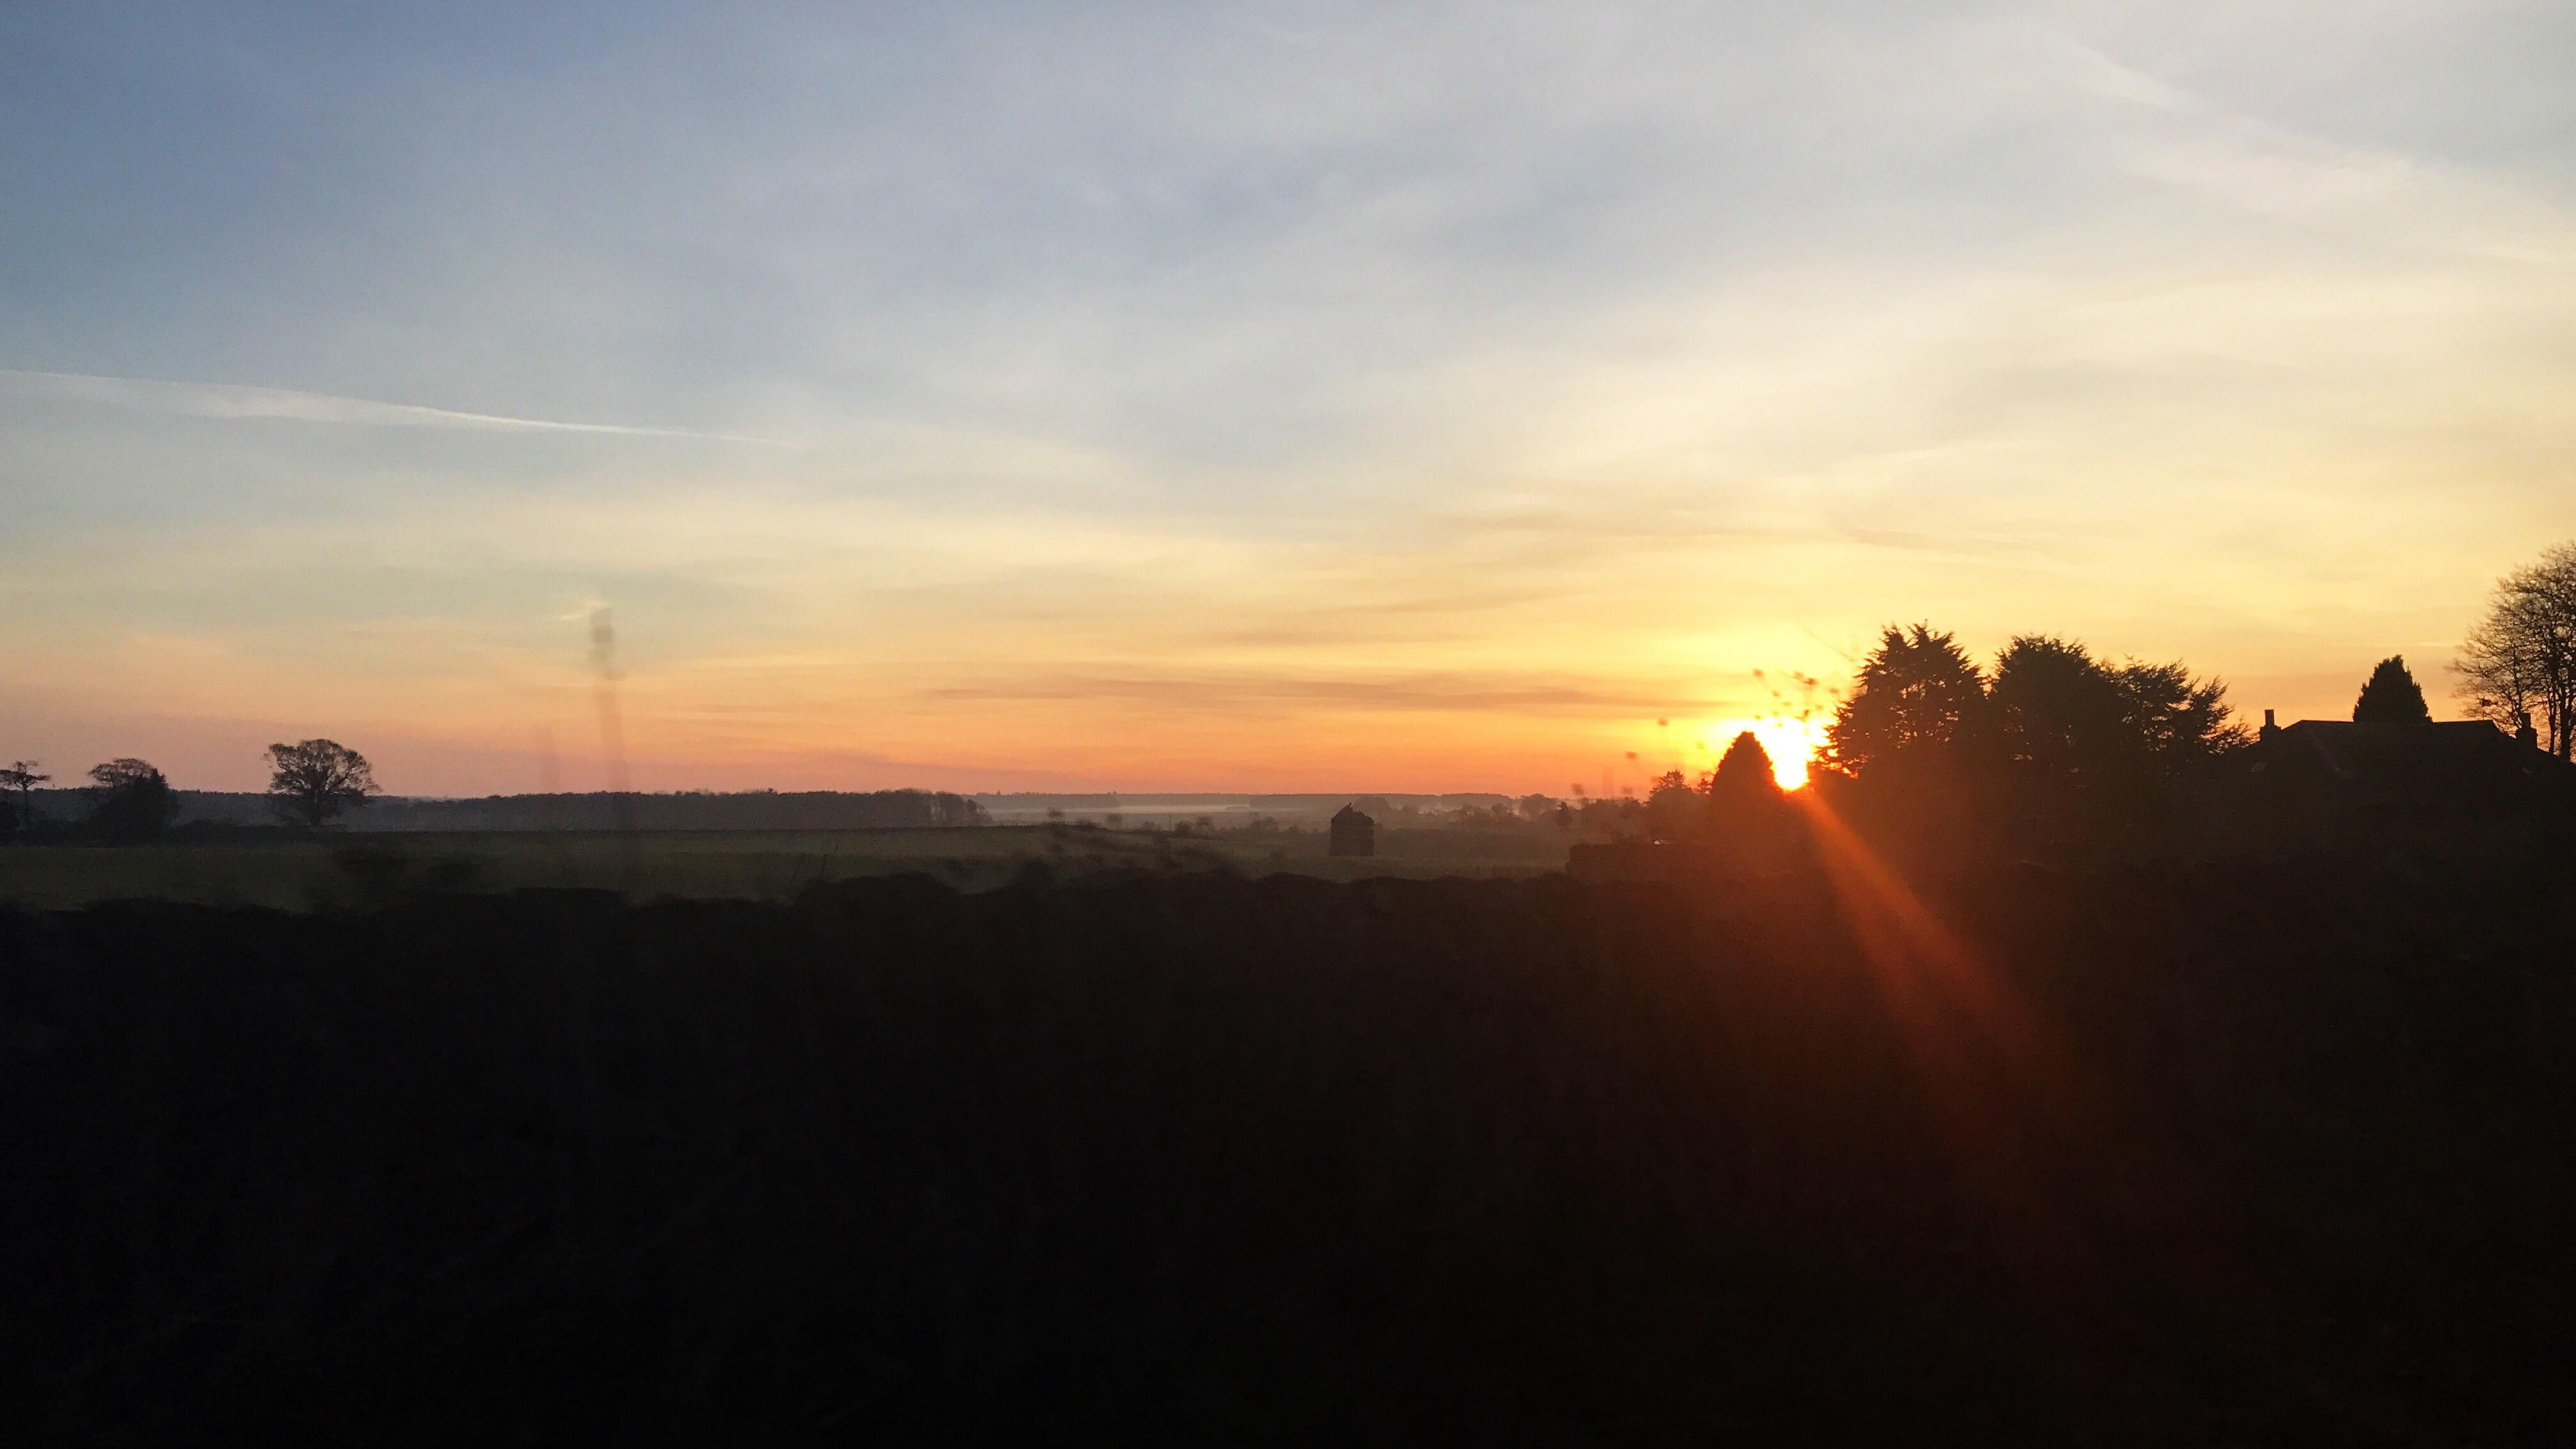 Country scene with sun rise peeking between trees.